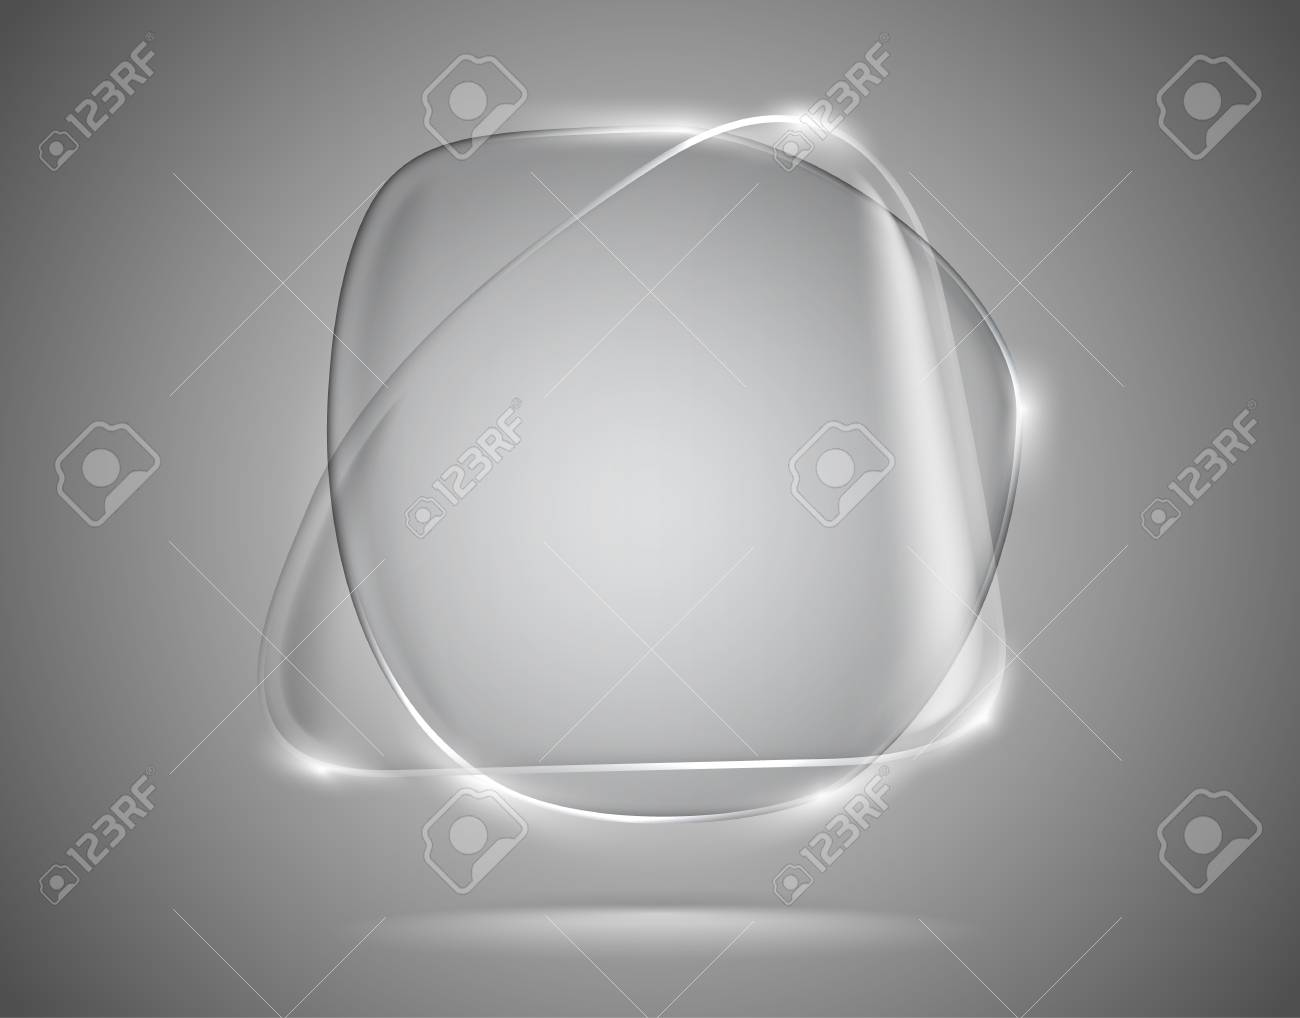 Transparent glass speech bubbles with lightened edges Stock Vector - 14559773